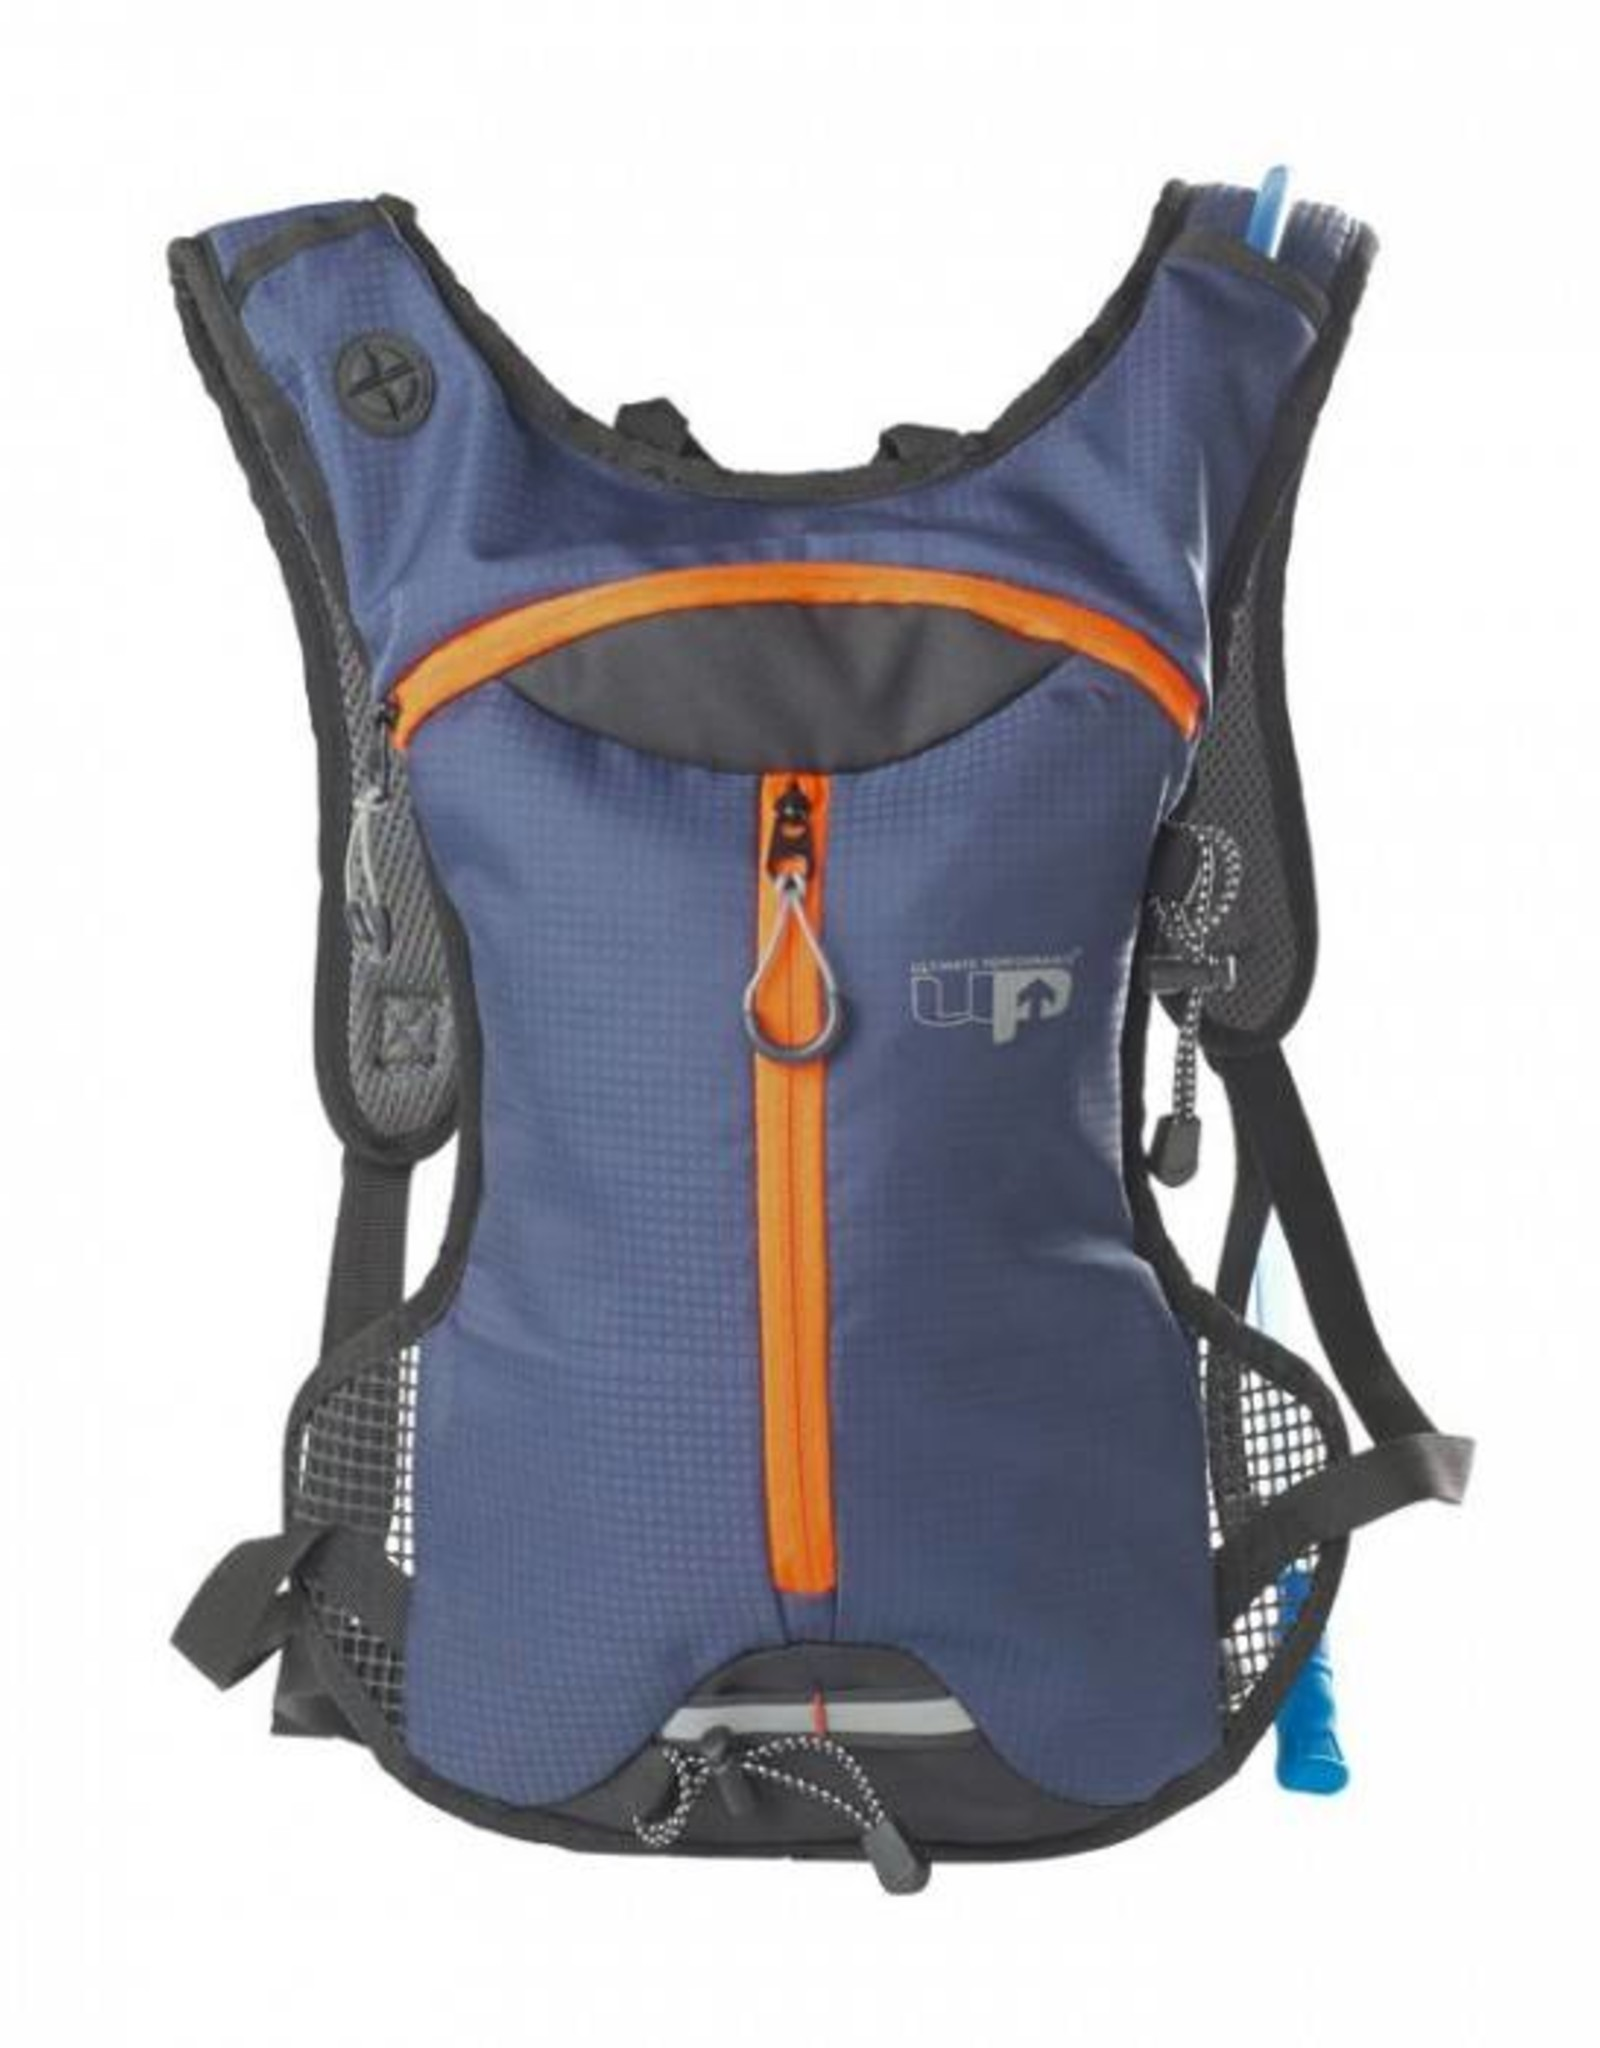 Tarn Hydration Pack 1.5L